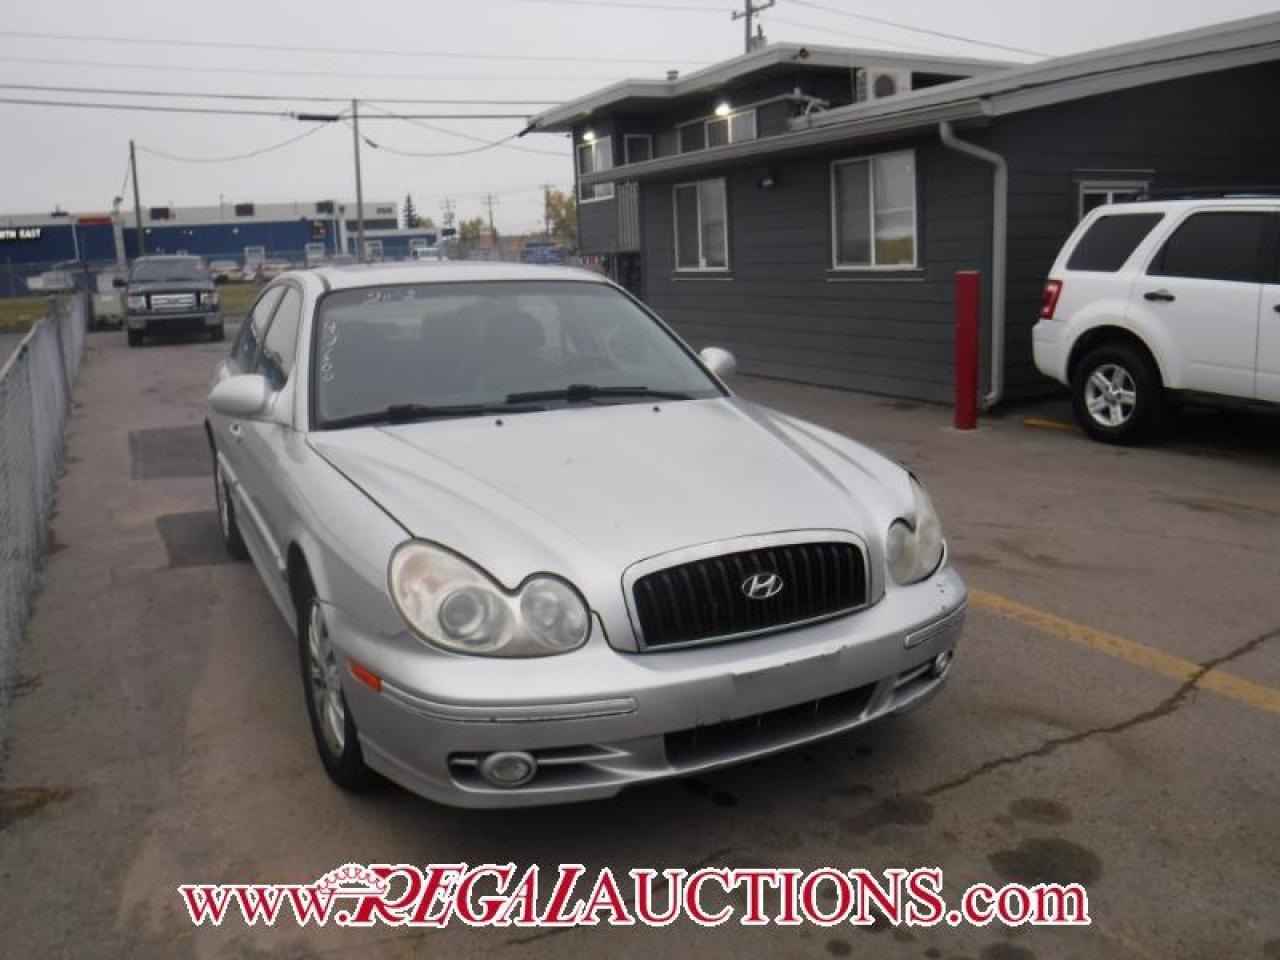 Photo of Silver 2002 Hyundai Sonata